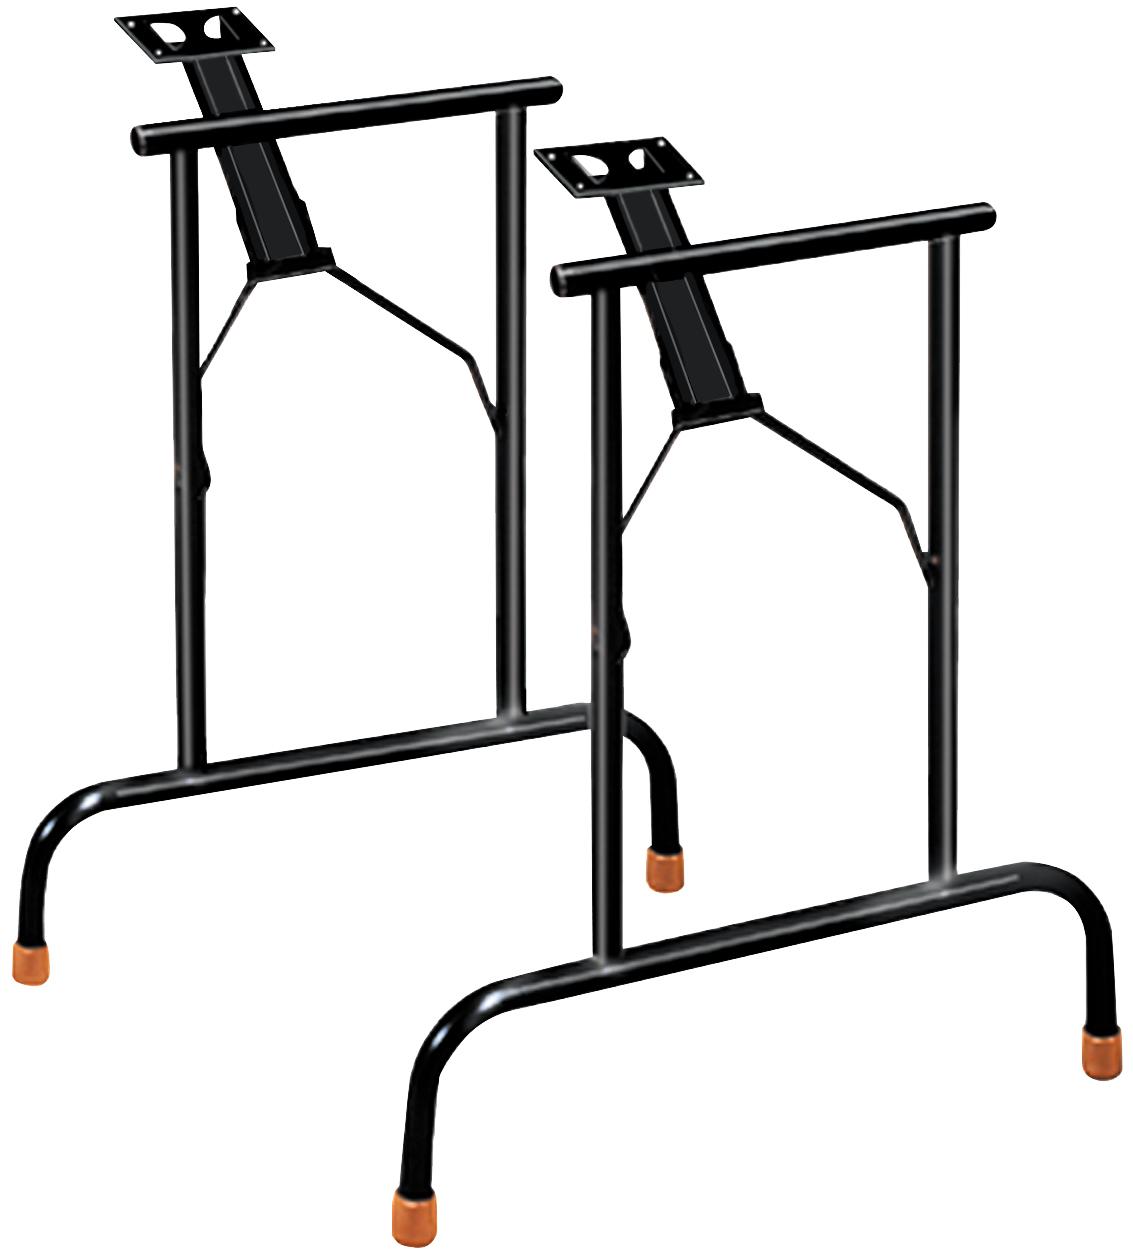 Adjustable Folding Table Legs Home Depot Full Image For